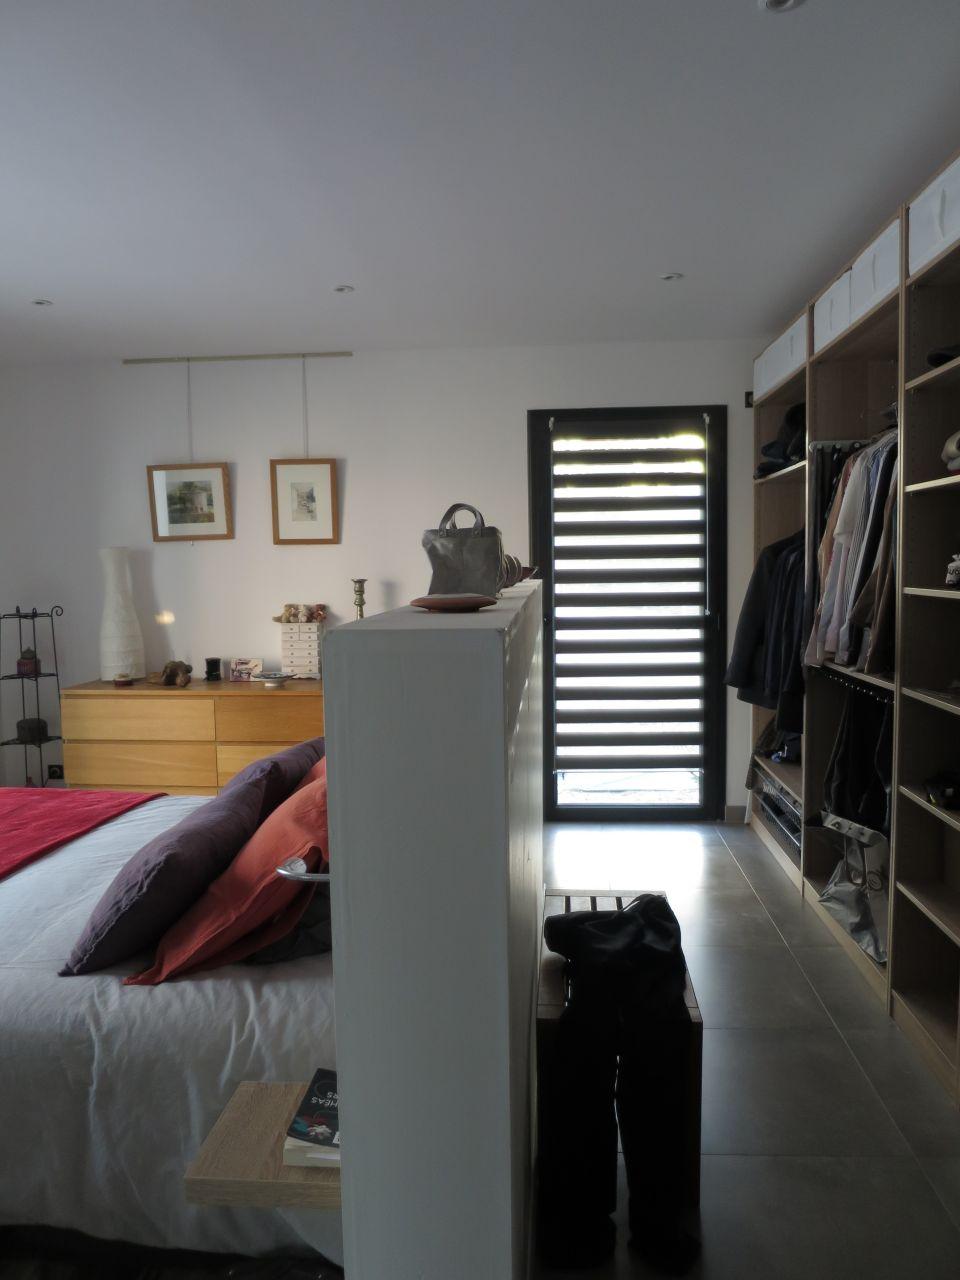 photo pose du store c t dressing d coration chambre d. Black Bedroom Furniture Sets. Home Design Ideas